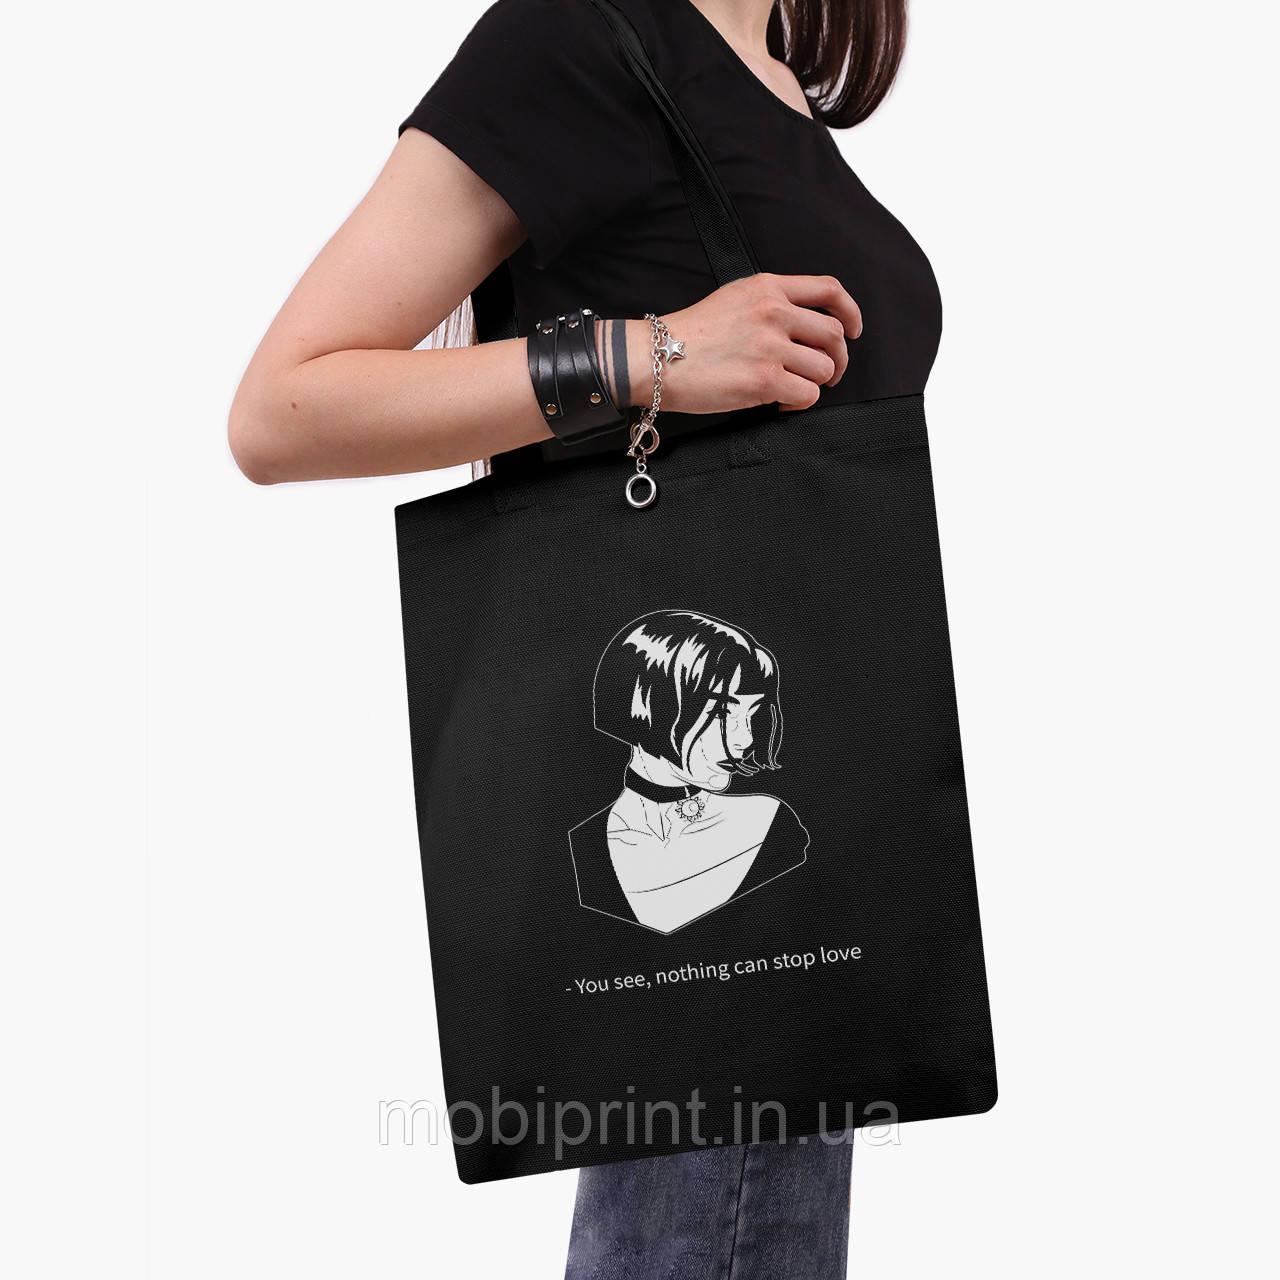 Еко сумка шоппер чорна Леон кілер (Leon) (9227-1450-2) экосумка шопер 41*35 см